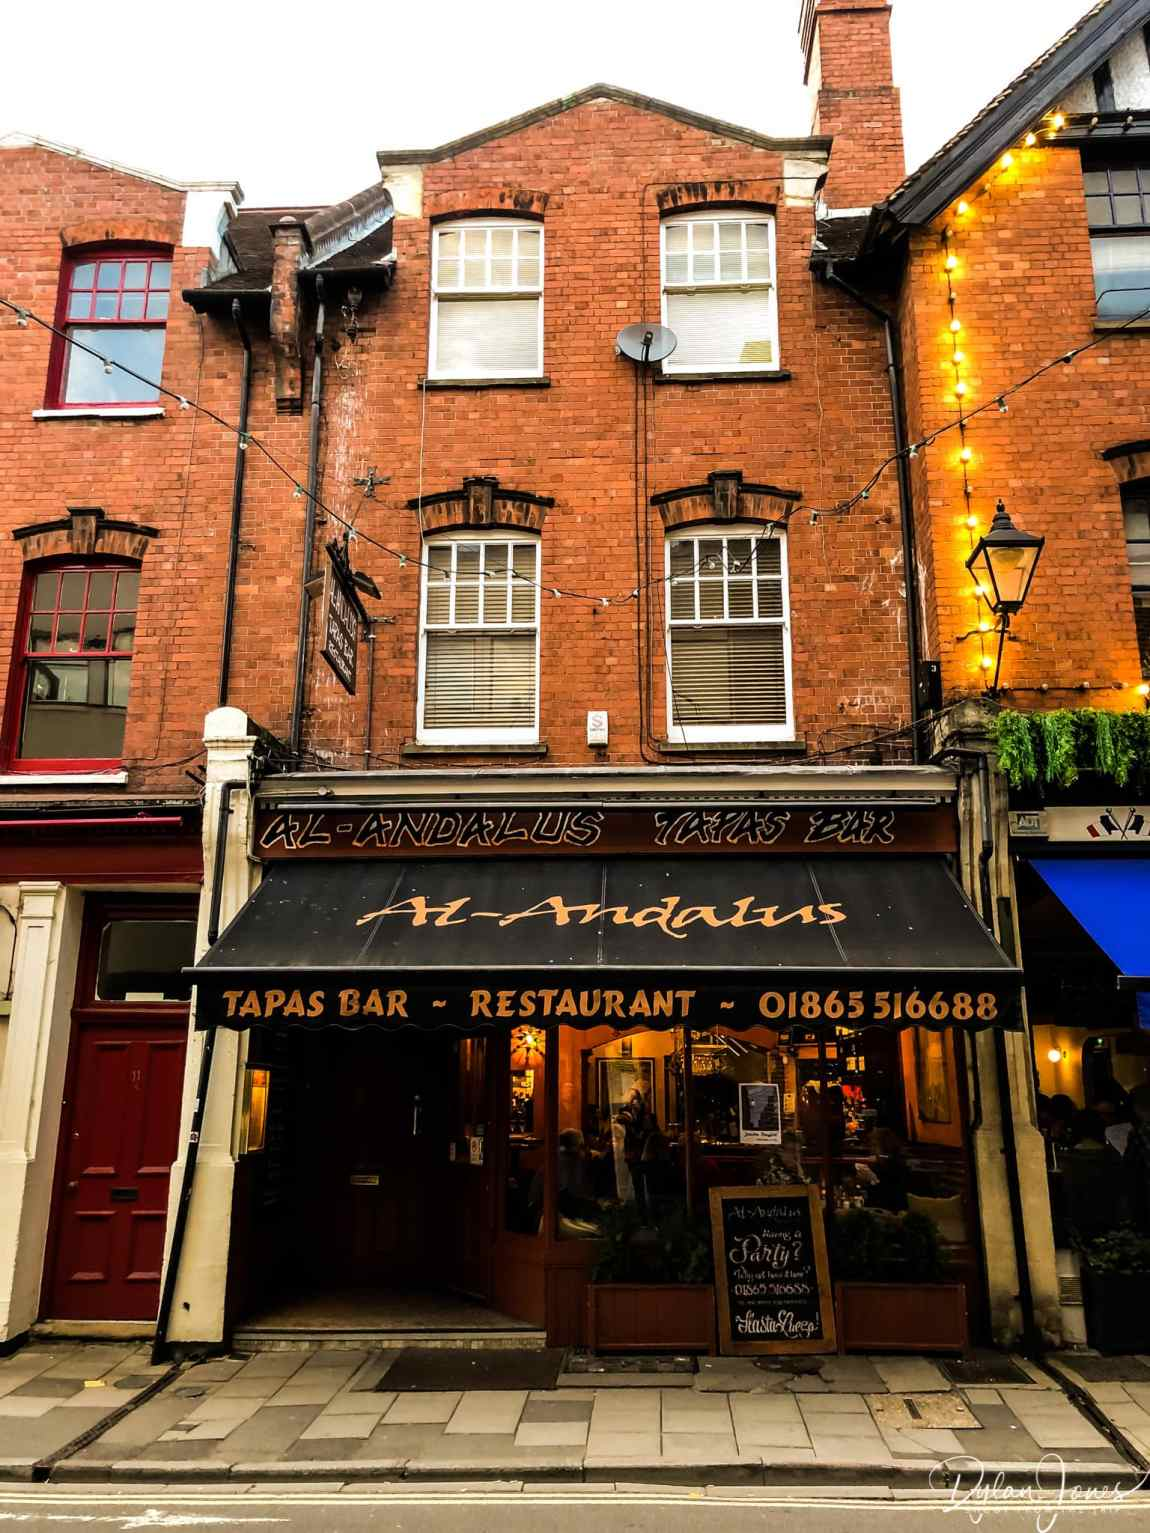 Al-Andalus Tapas Bar in Jericho, Oxford